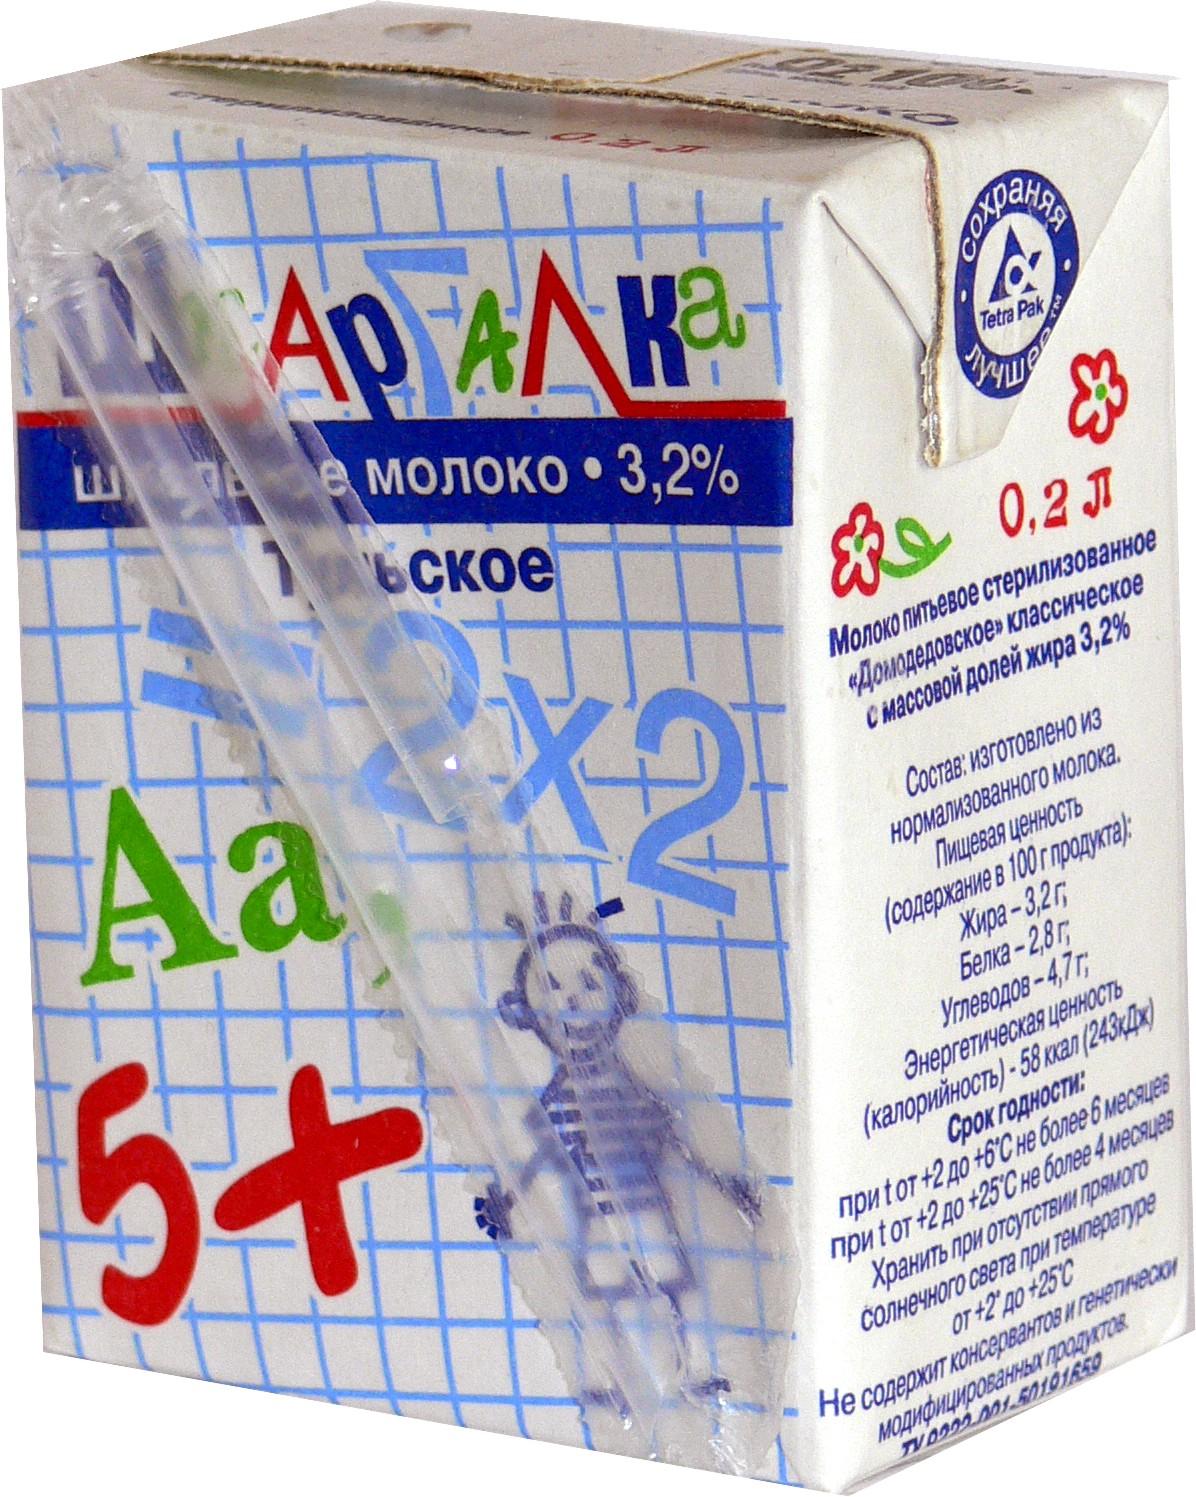 Тольятти молоко шпаргалка